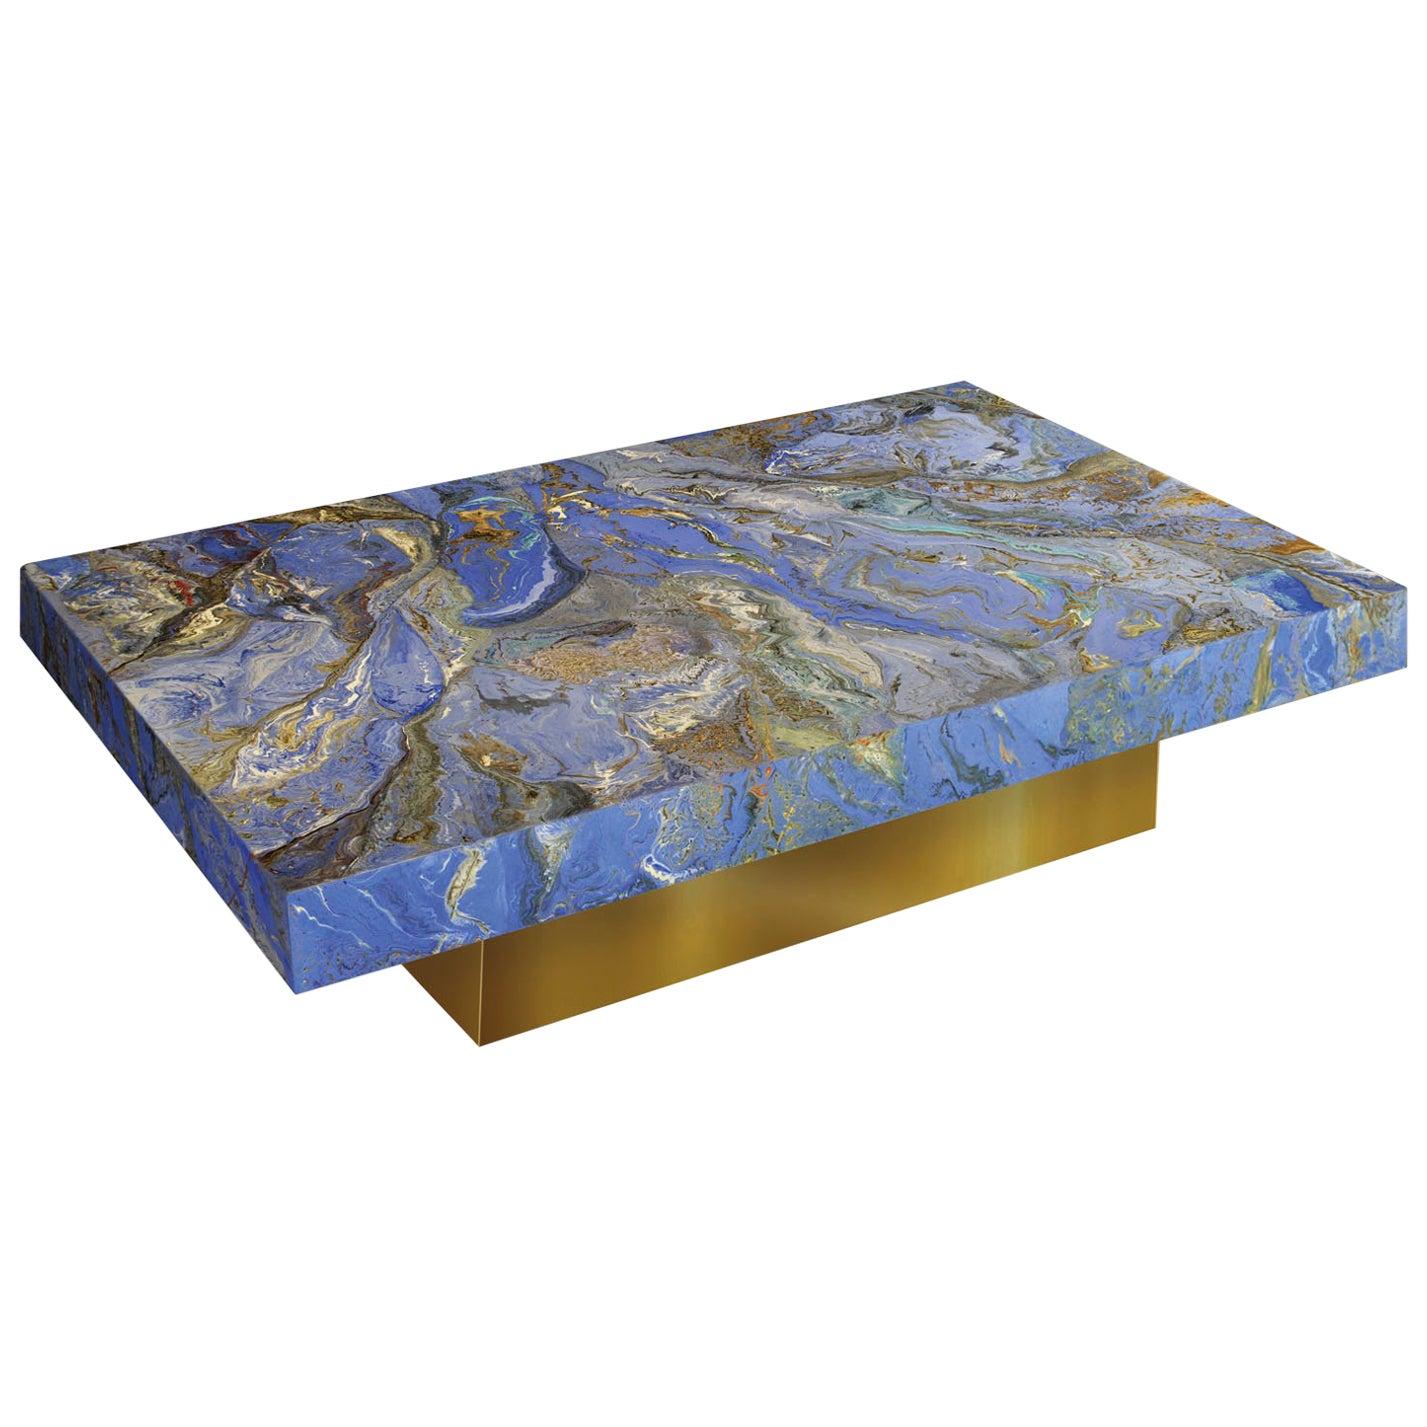 Cobalt  blue Coffee Table  Marbled Scagliola Decoration Gold Leaf Wooden Base